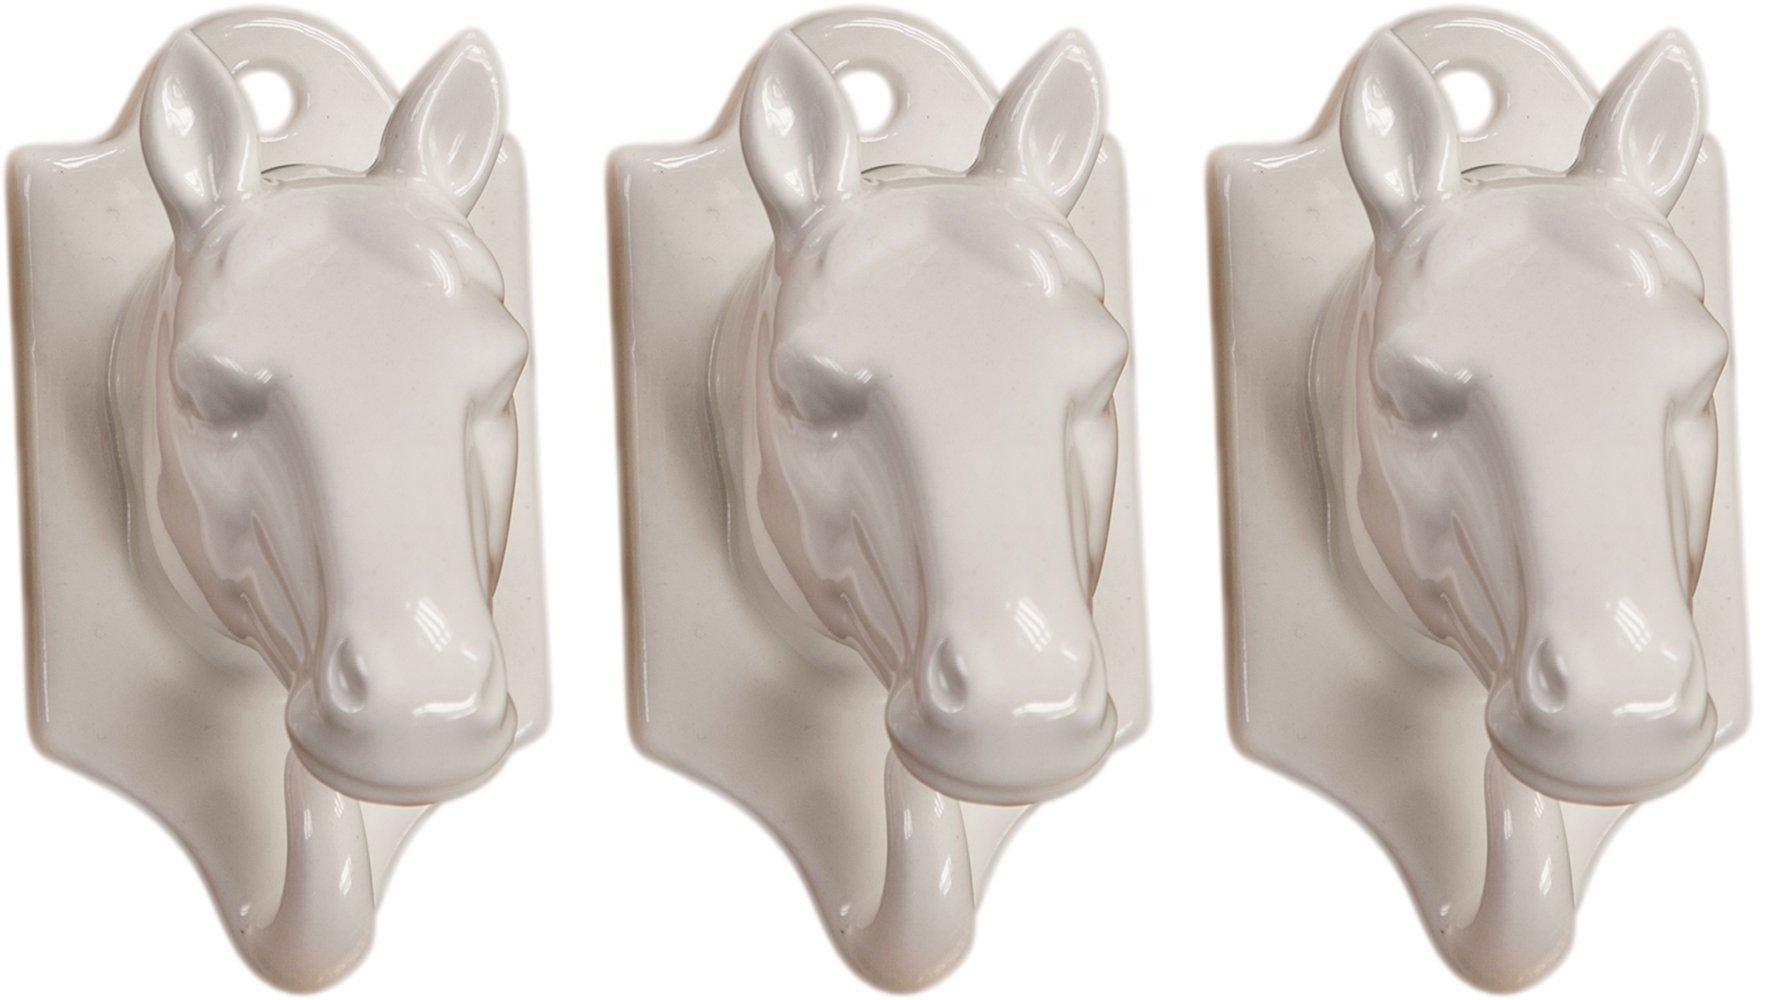 Manual White Horse Ceramic Kitchen Towel Hooks Hanging Wall Art ICWHHH 4x2.25'' Set of 3 White